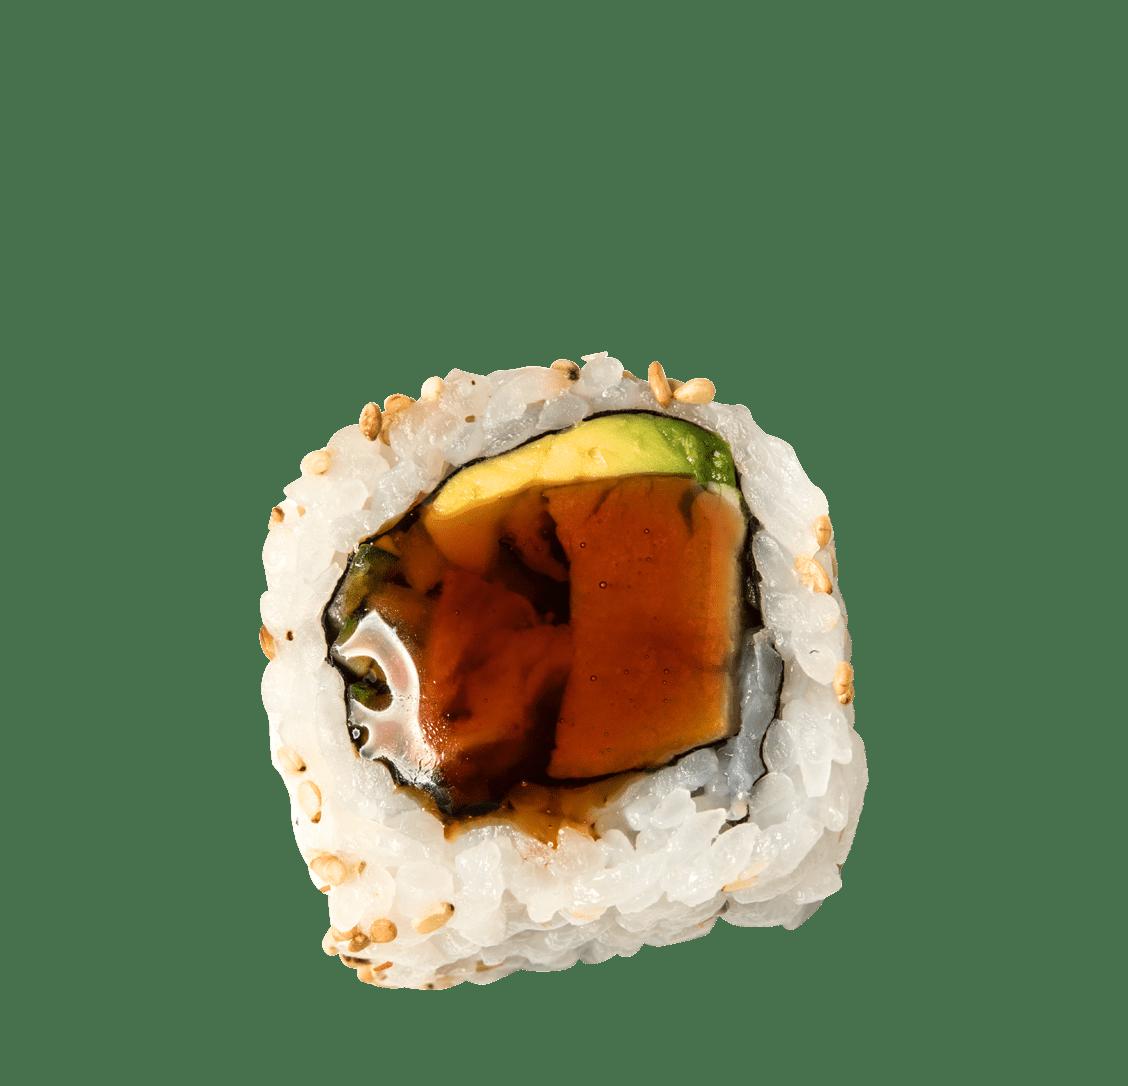 Hühnchen, Gurke, Avocado, Teriyakisauce title=Chicken Teriyaki Roll </br>8,50 €